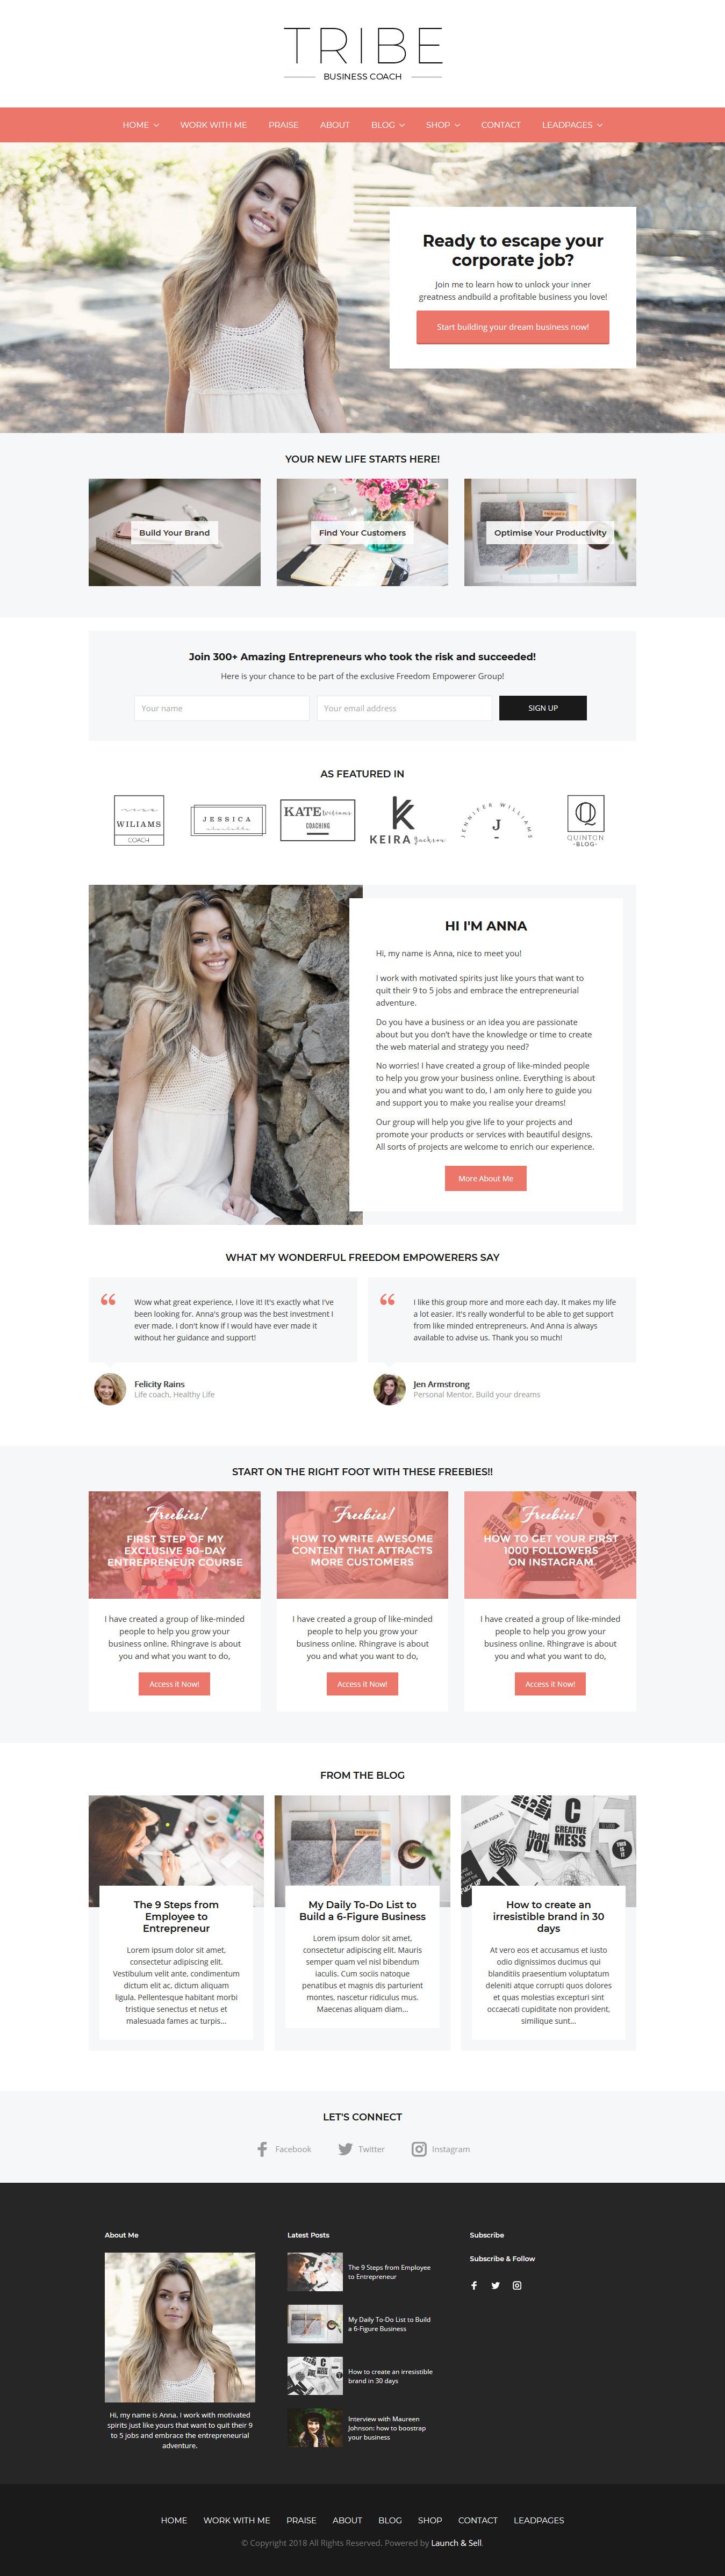 tribe coach best premium feminine wordpress theme - 10+ Best Feminine WordPress Themes (Premium Version)